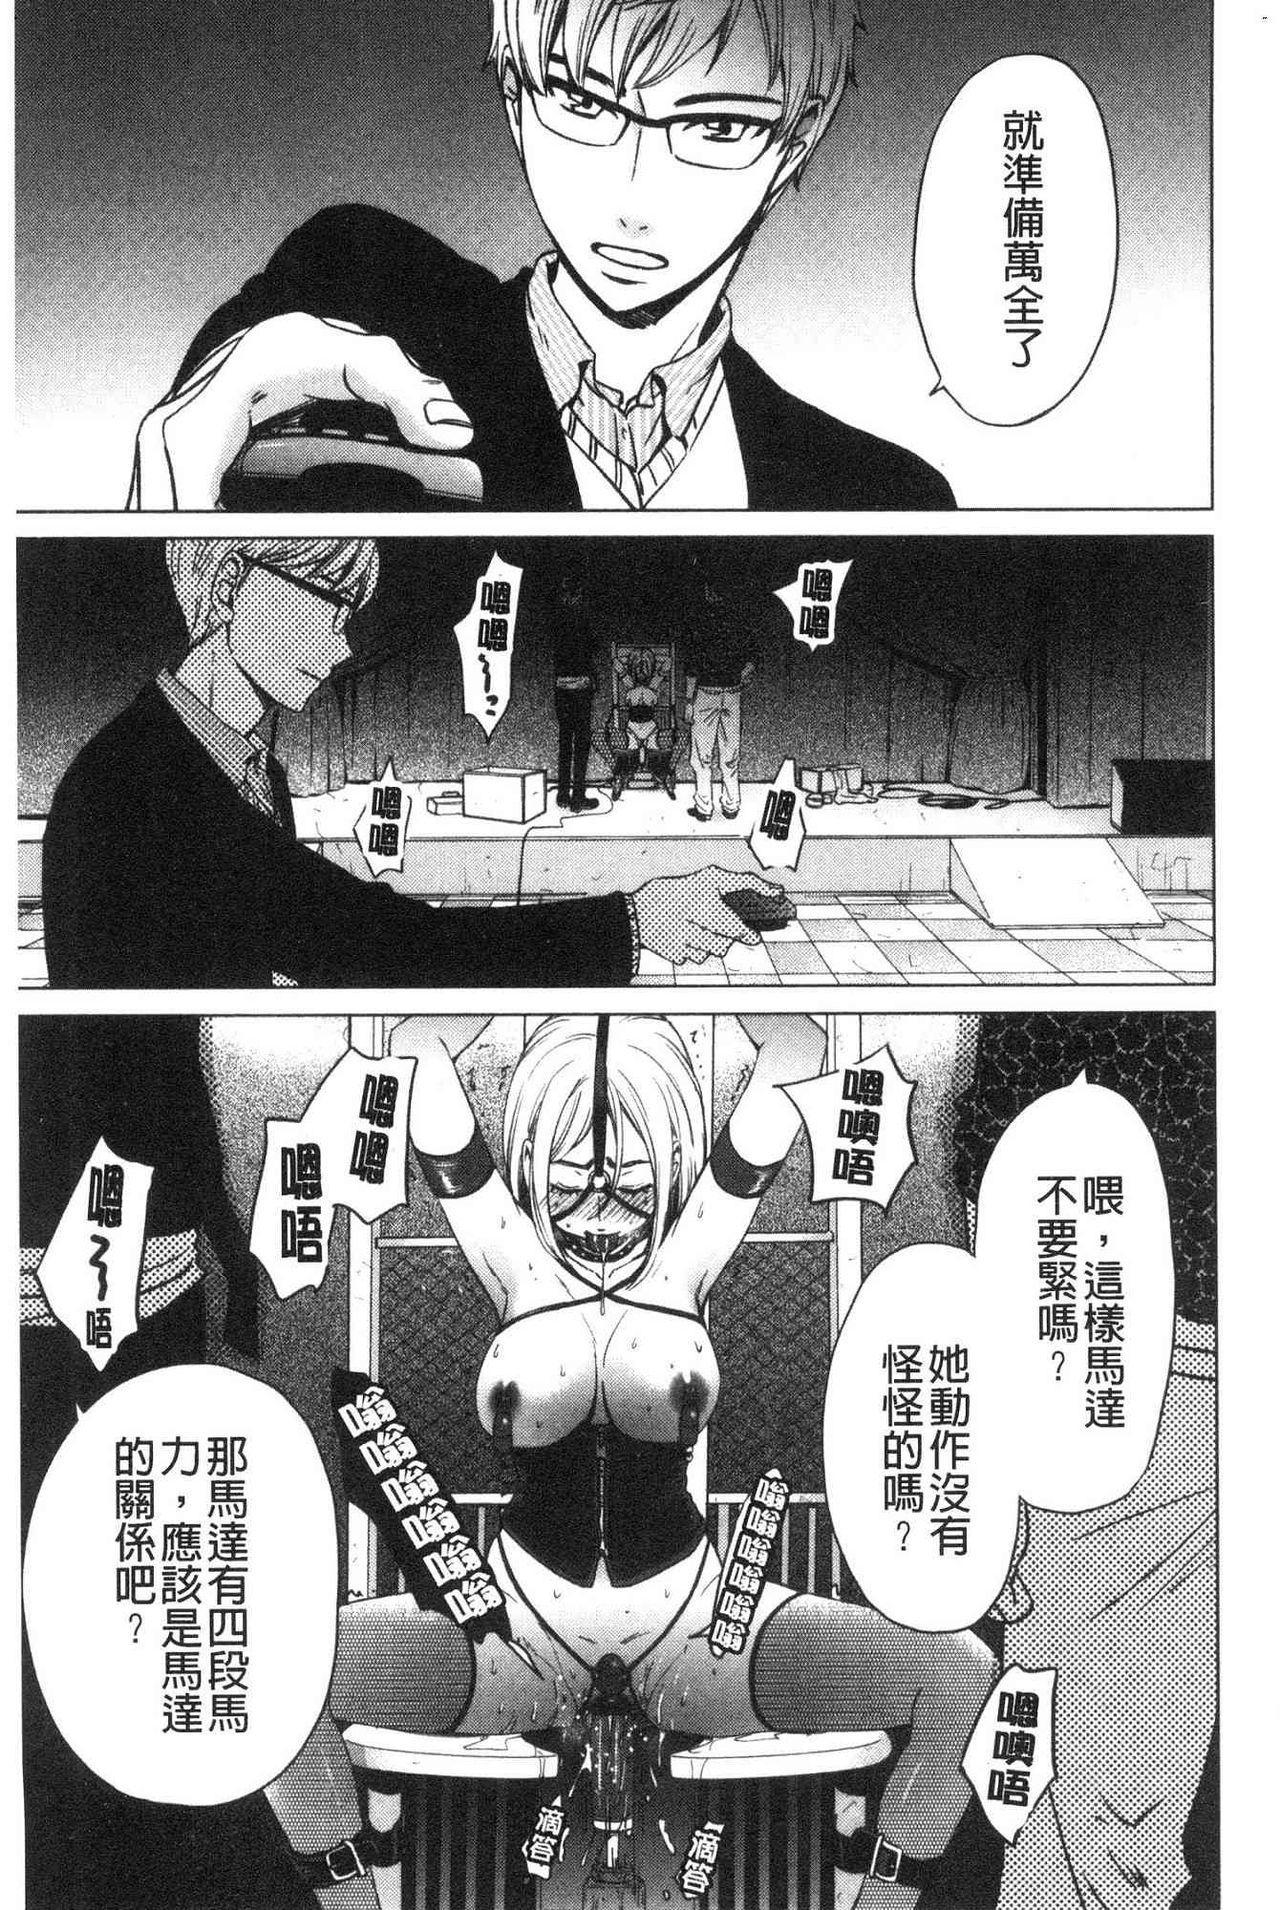 [Gotoh Akira]  21-ji no Onna ~Camera no Mae no Mesuinu~ 2 | 21時之女 ~鏡頭前的牝犬~ 2 [Chinese] 152